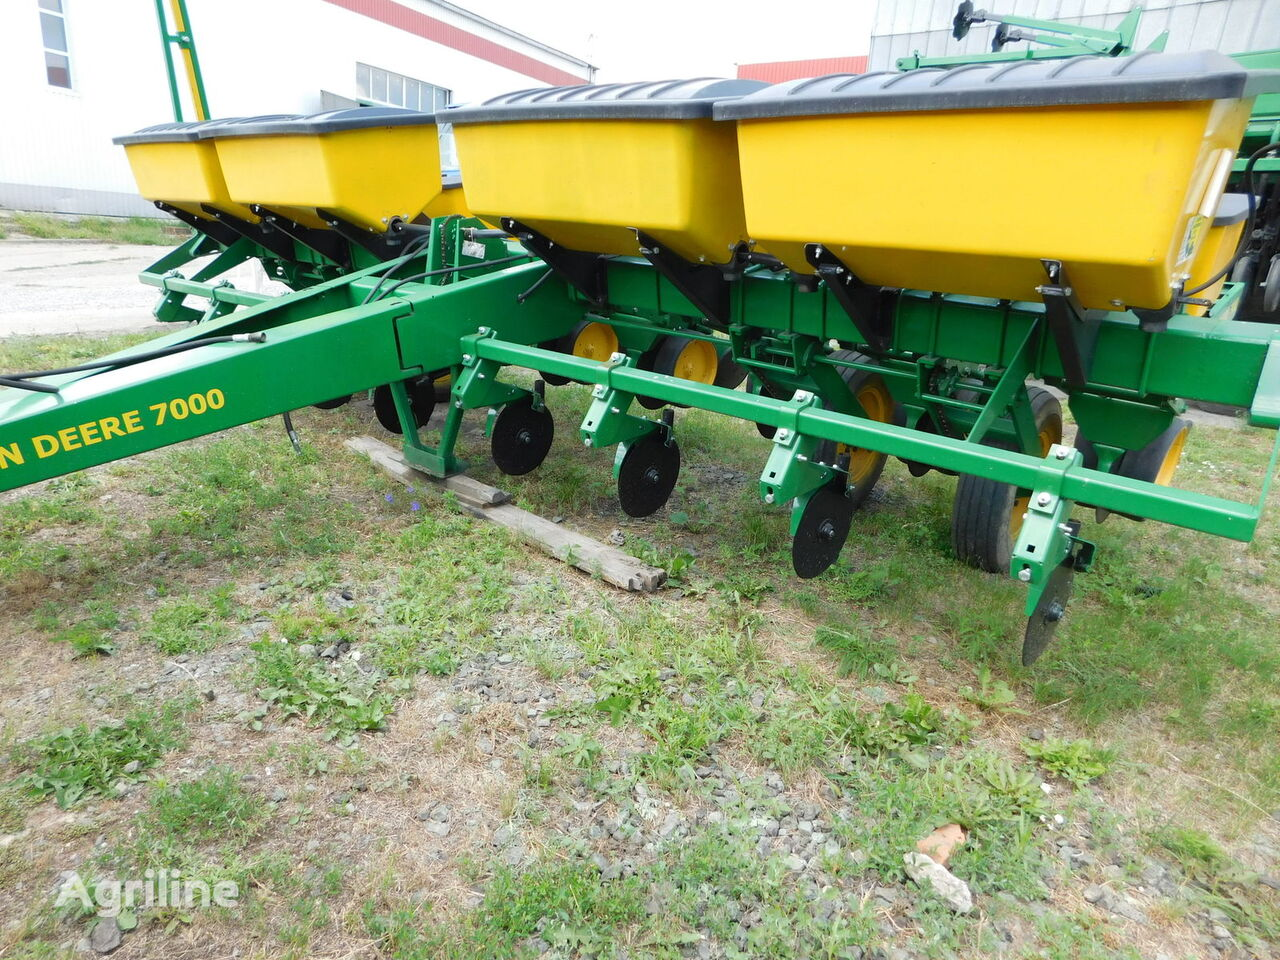 JOHN DEERE 7000 8p mechanical precision seed drill